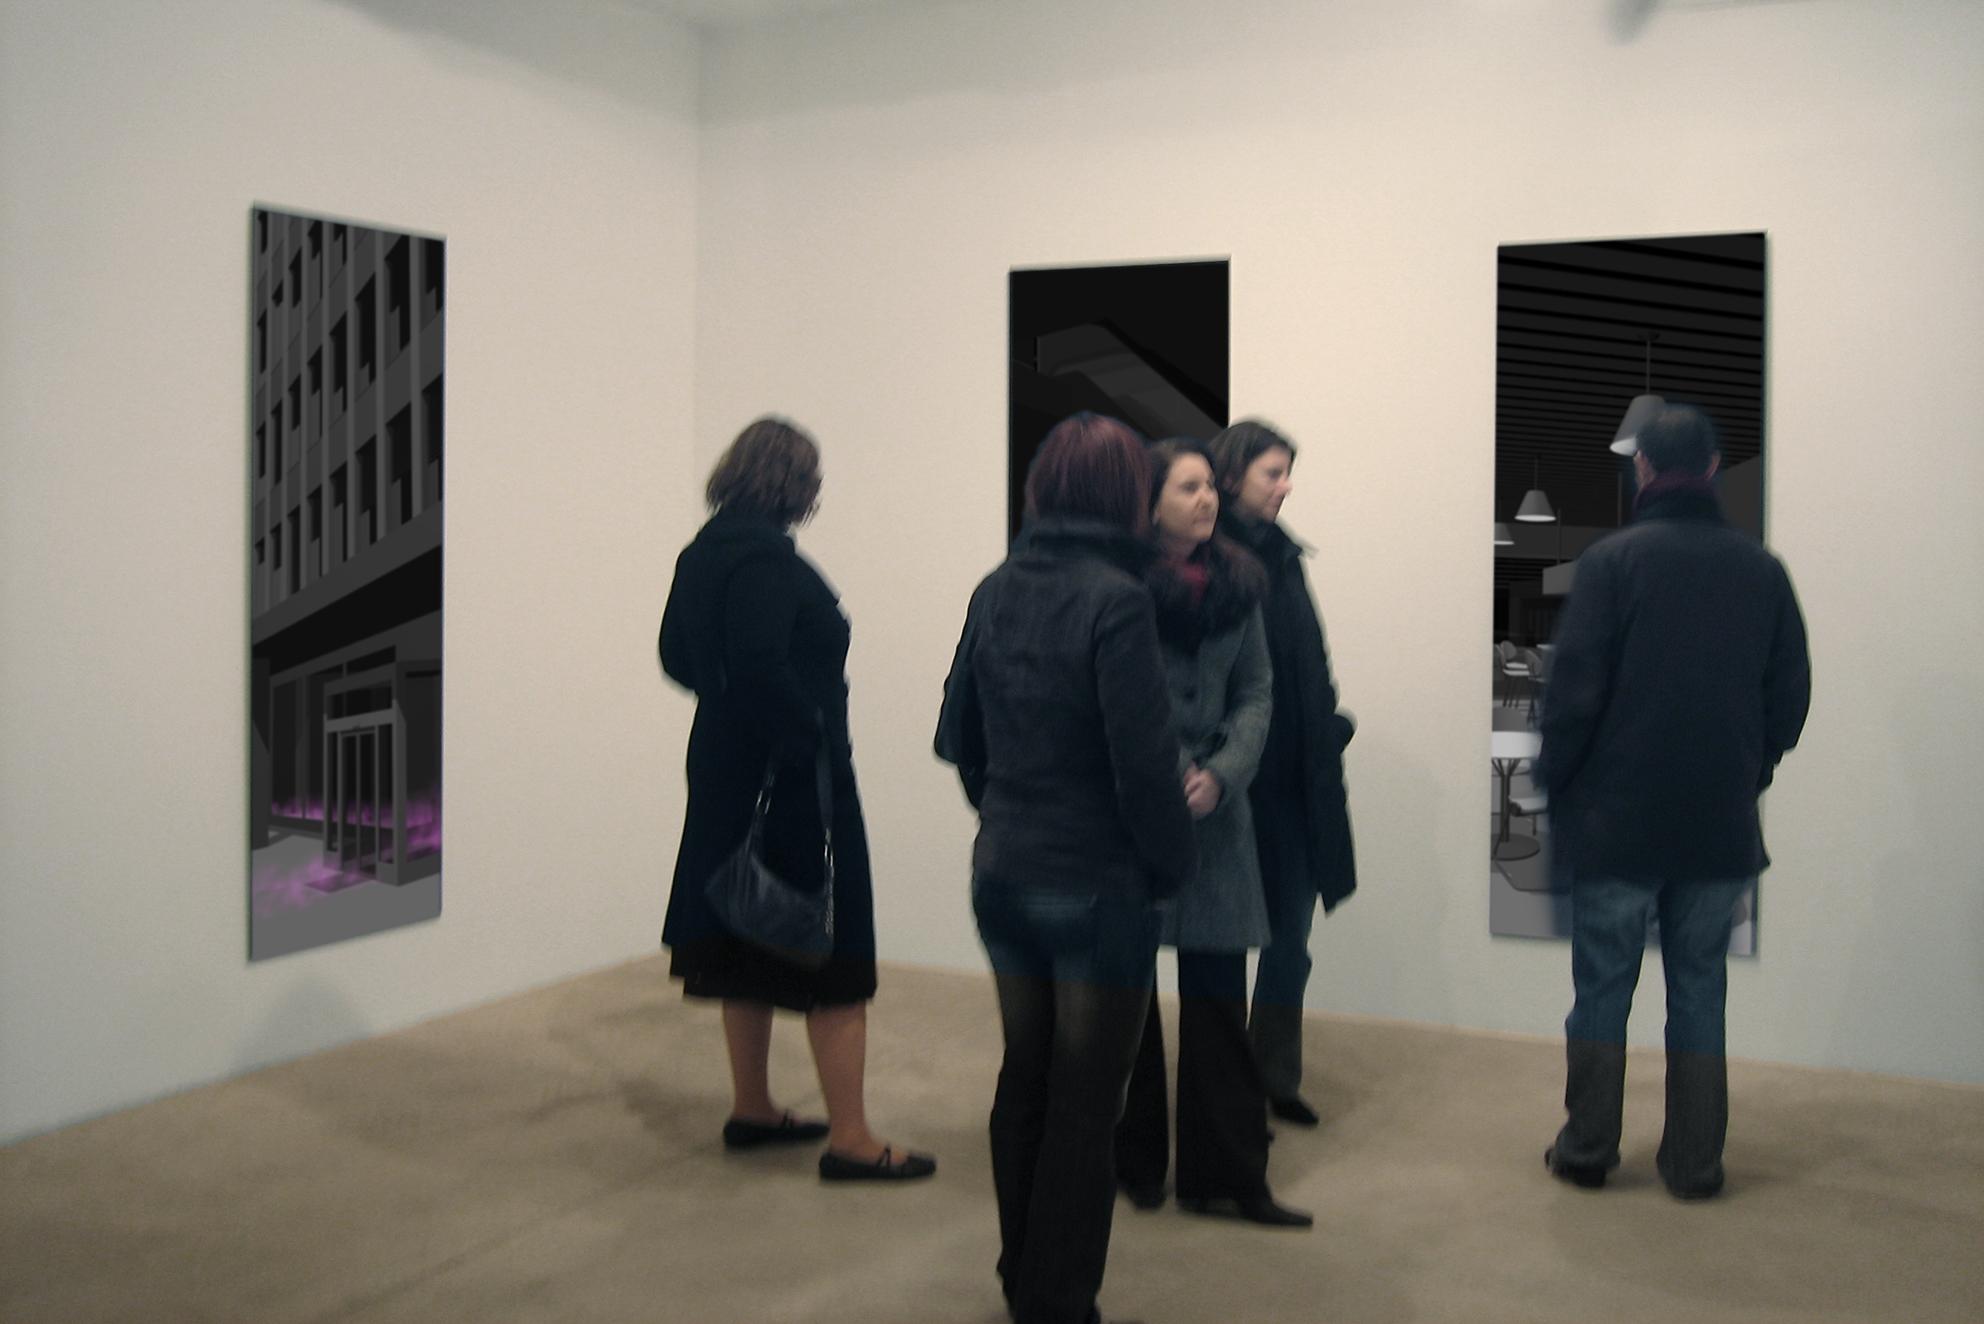 No comment, series of 5 photographs, lambda print / 2 Plexiglas slab 200 x 75 x 1 cm, 2007, in collaboration with Swann Thommen